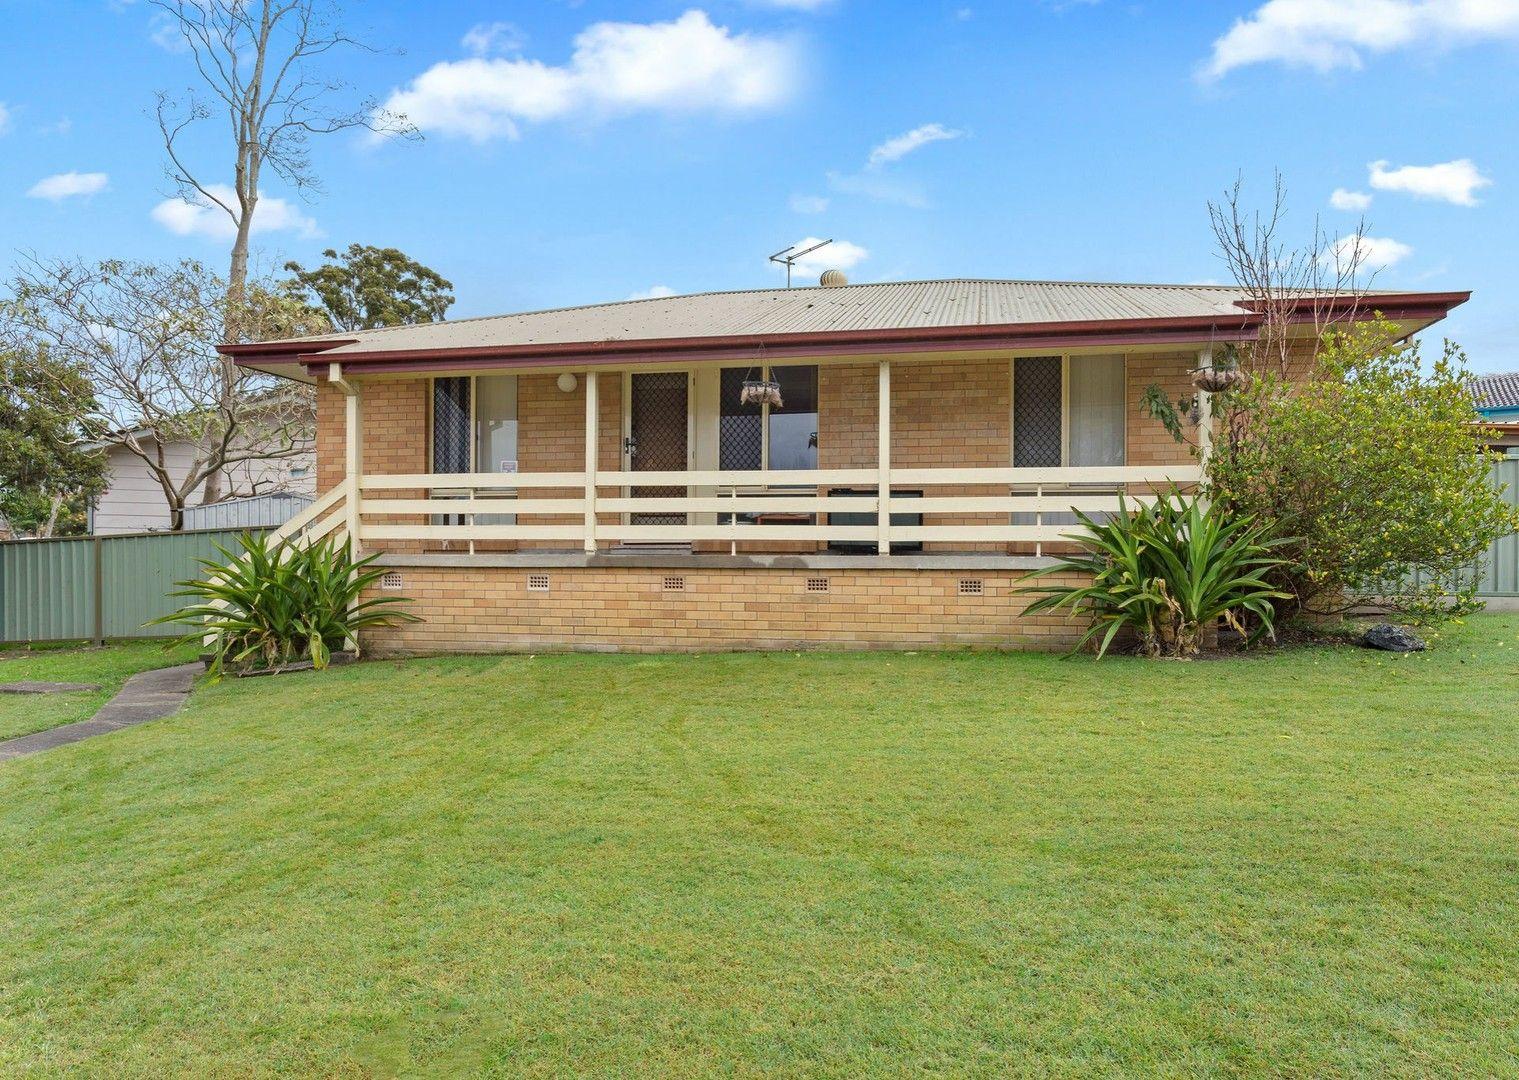 8 Pindari Crescent, Taree NSW 2430, Image 0